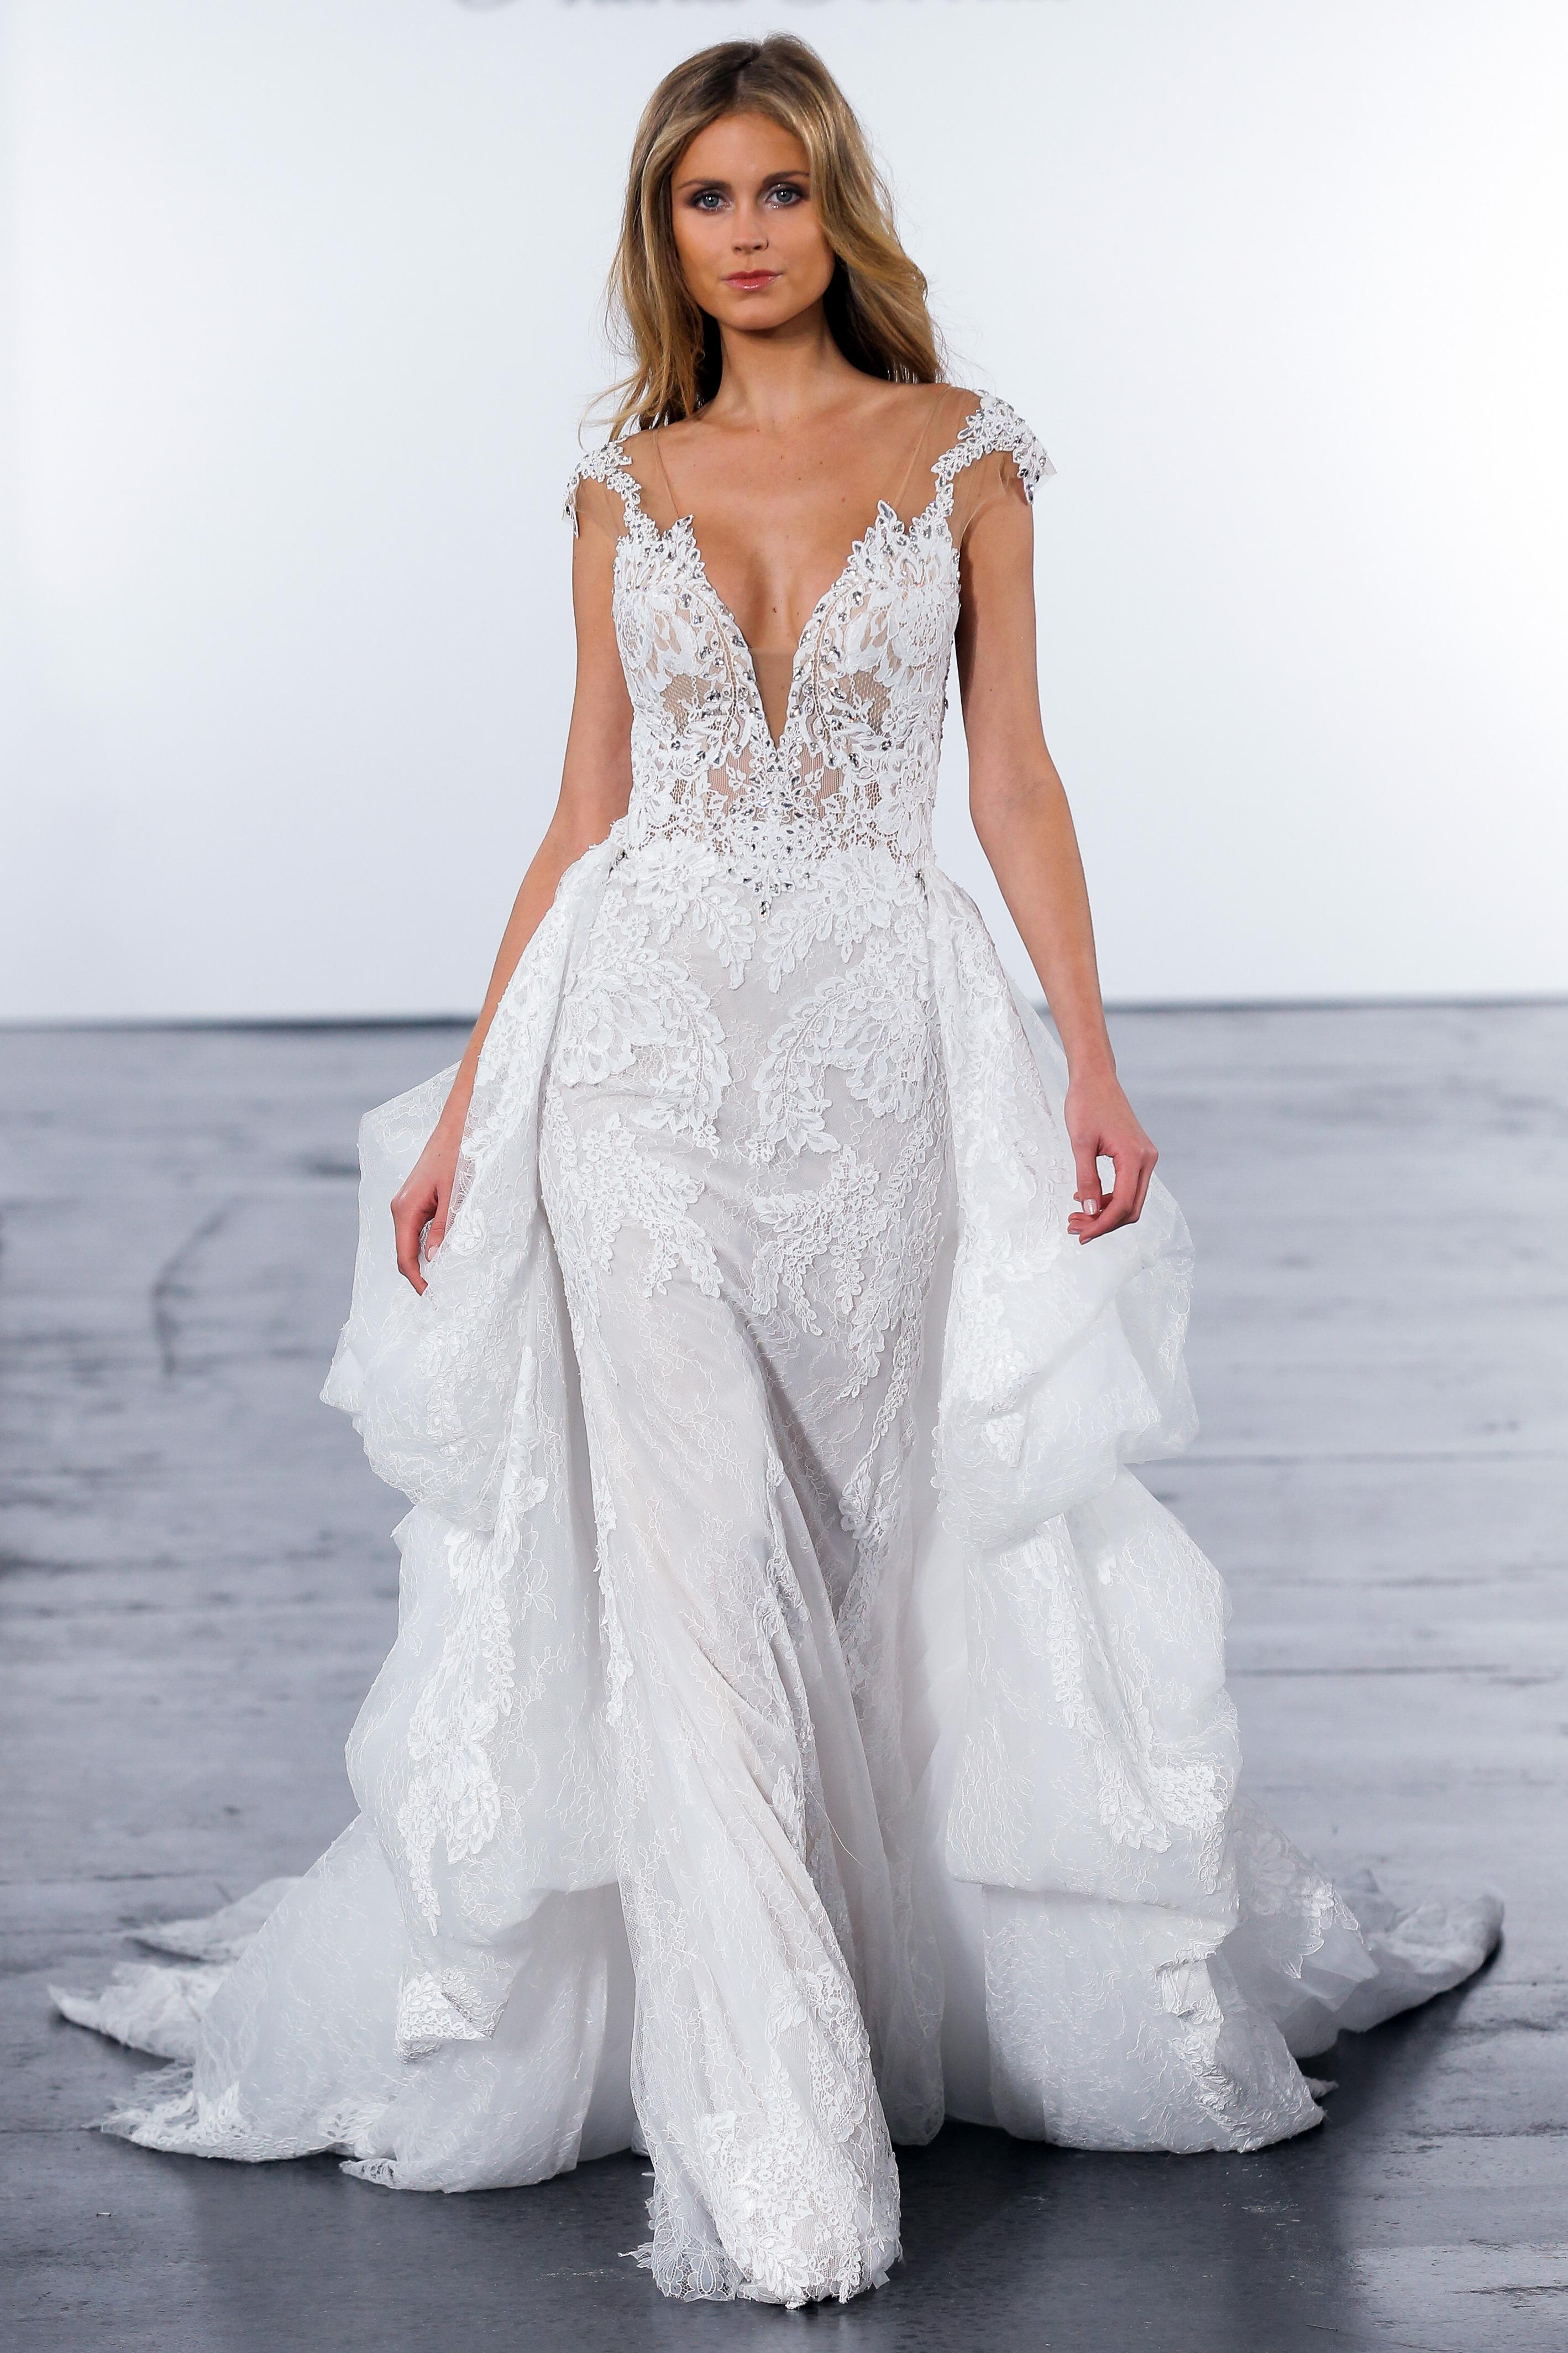 pnina tornai fall 2018 plunging v-neck long train wedding dress